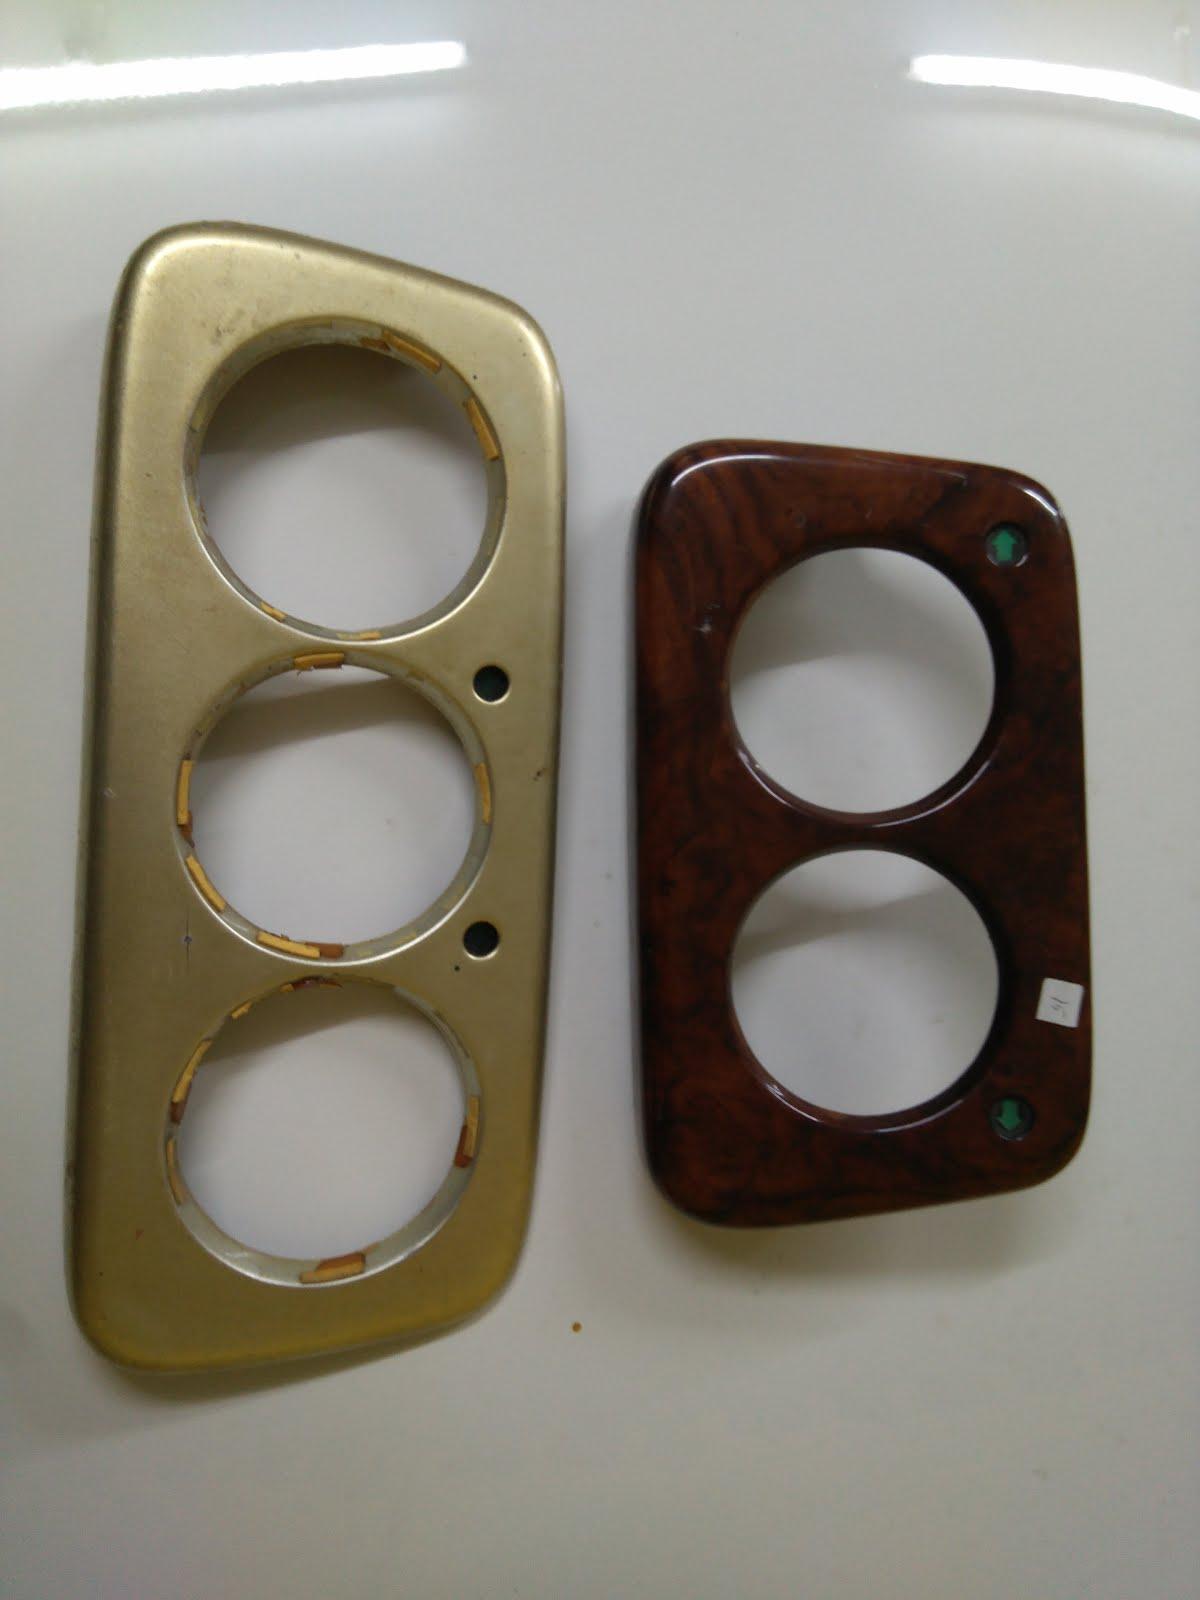 Tábua para tablier 2 e 3 manómetros